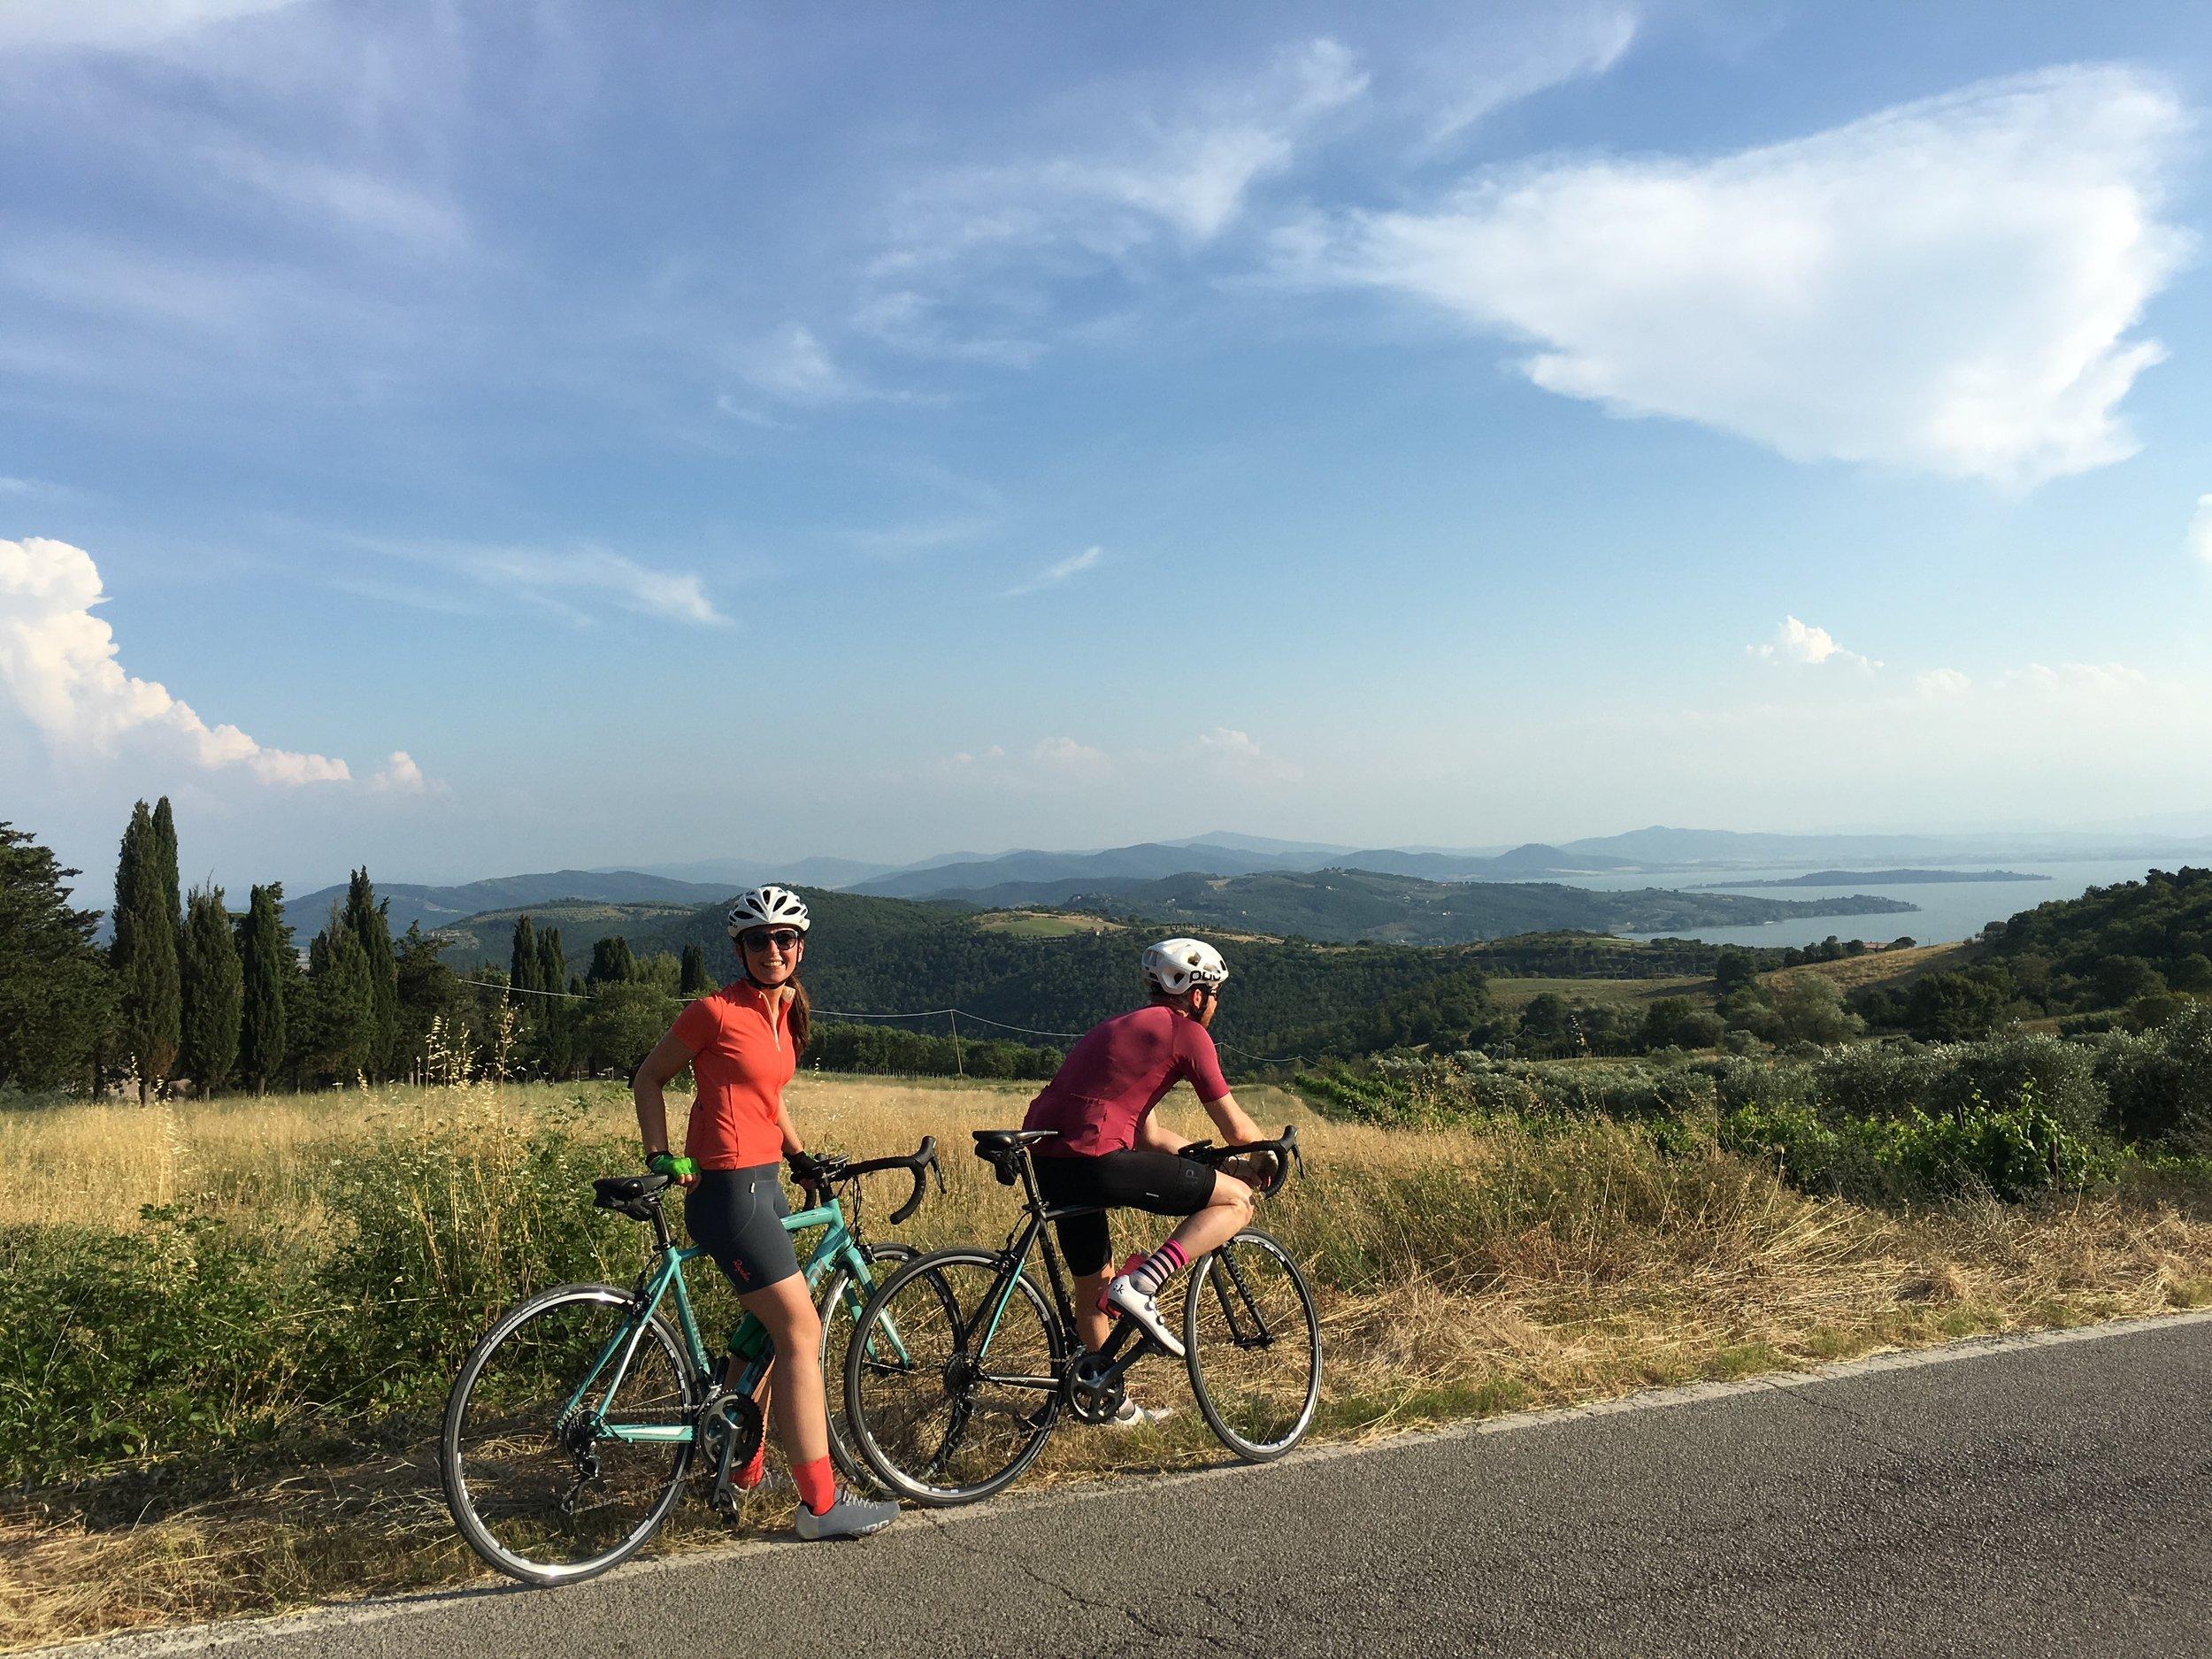 The roads around Lake Trasimeno are blissfully free of traffic